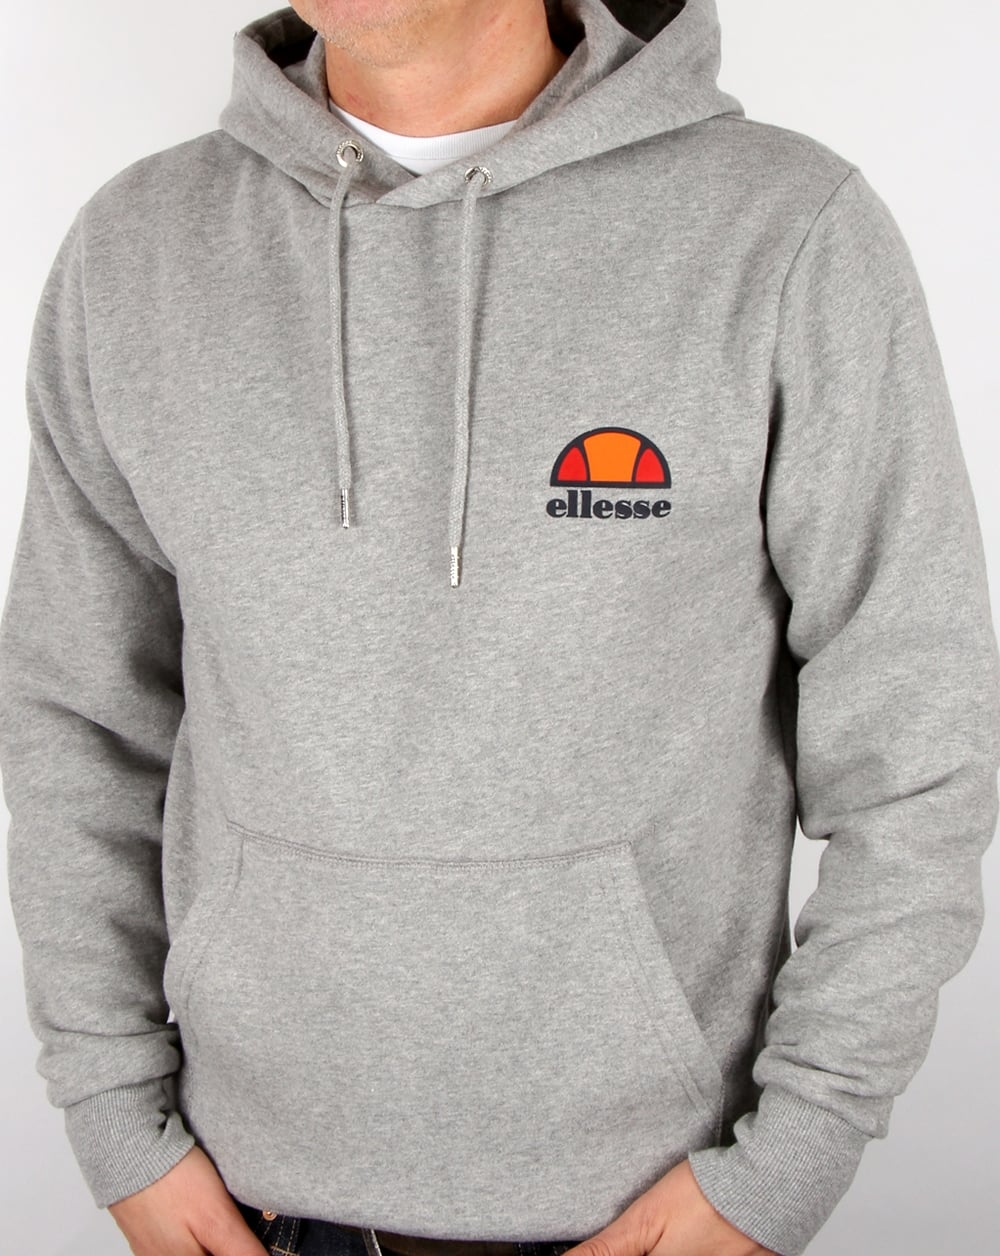 b43c0e81 Ellesse Hoody Athletic Grey